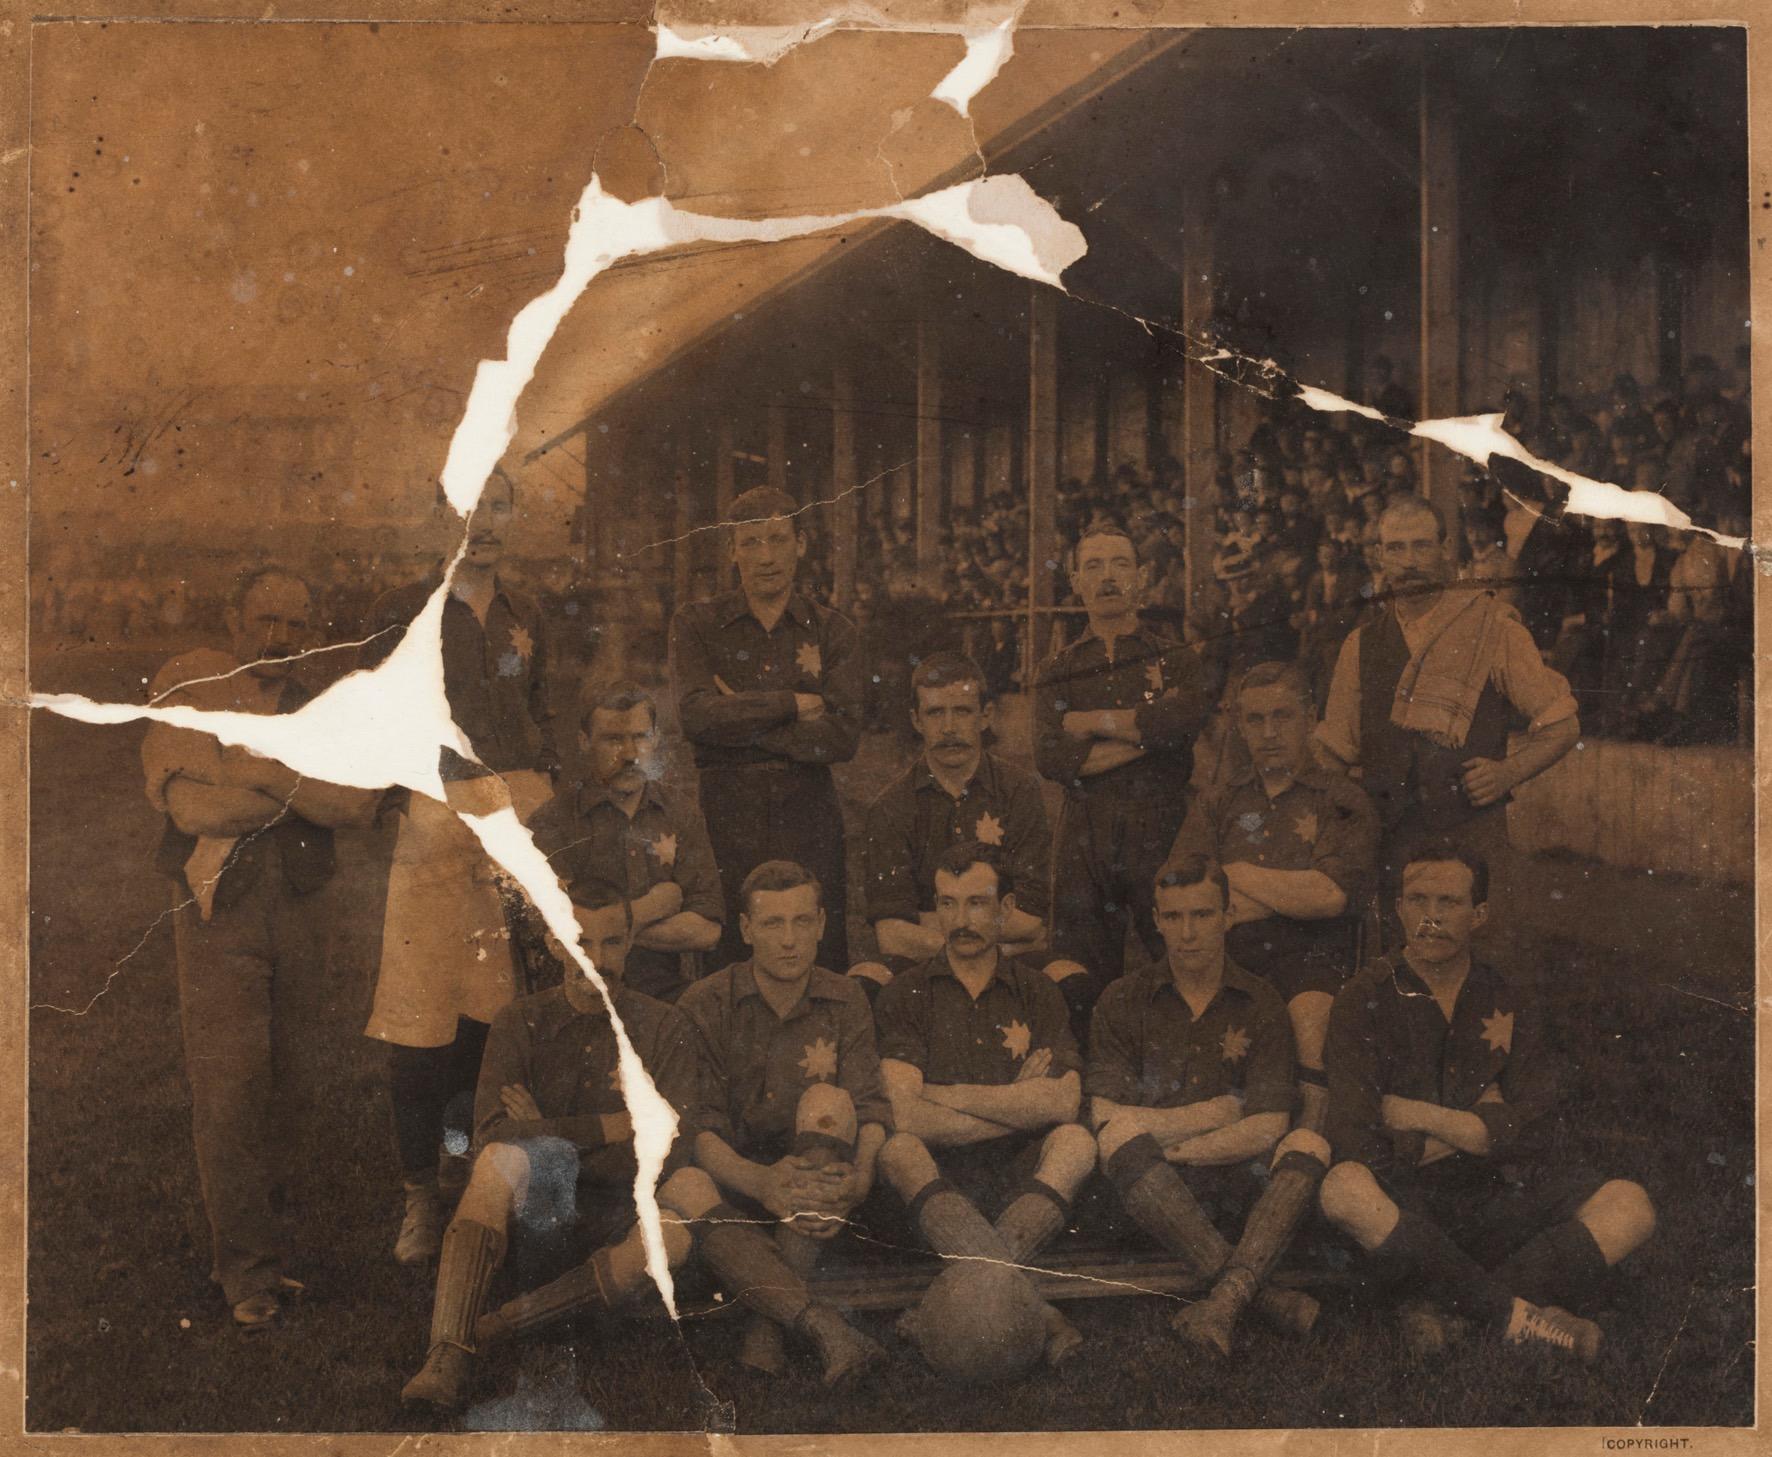 Original team photo